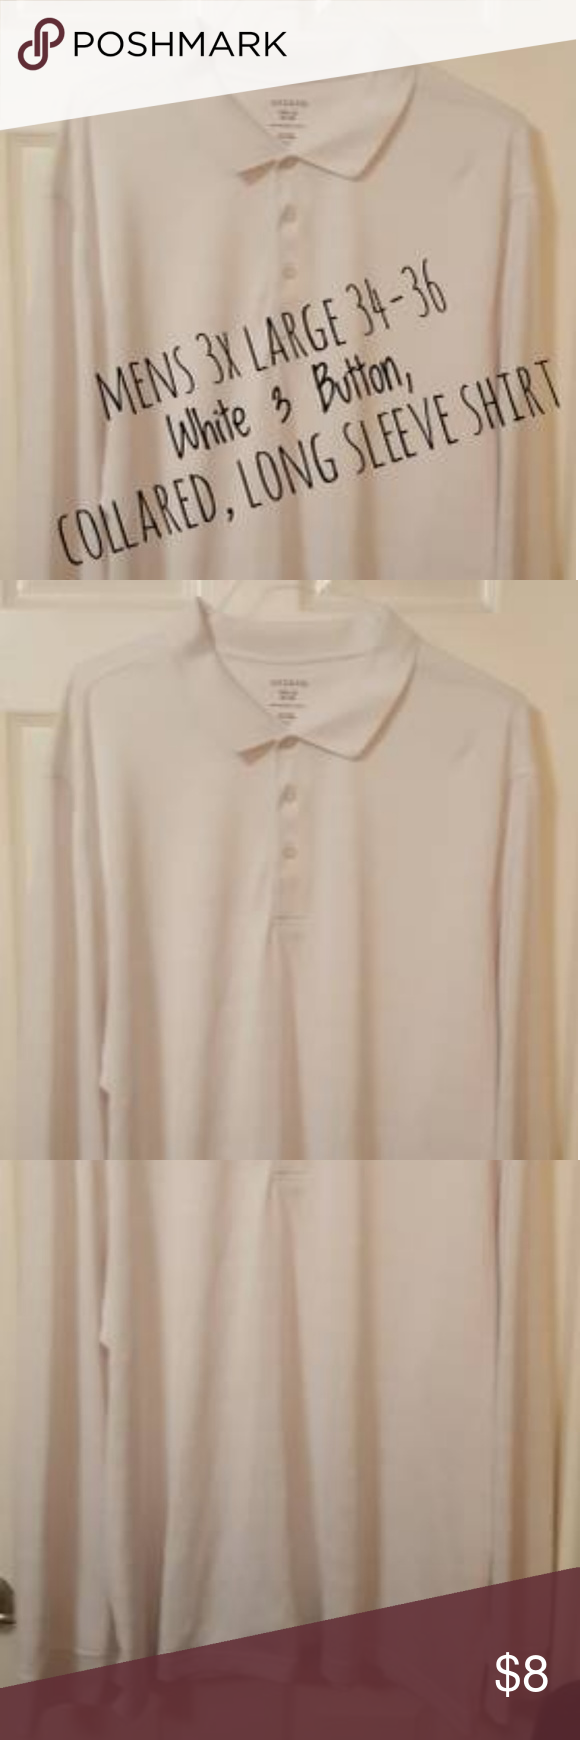 George Mens 3 Button Collared White Texture Shirt My Posh Closet